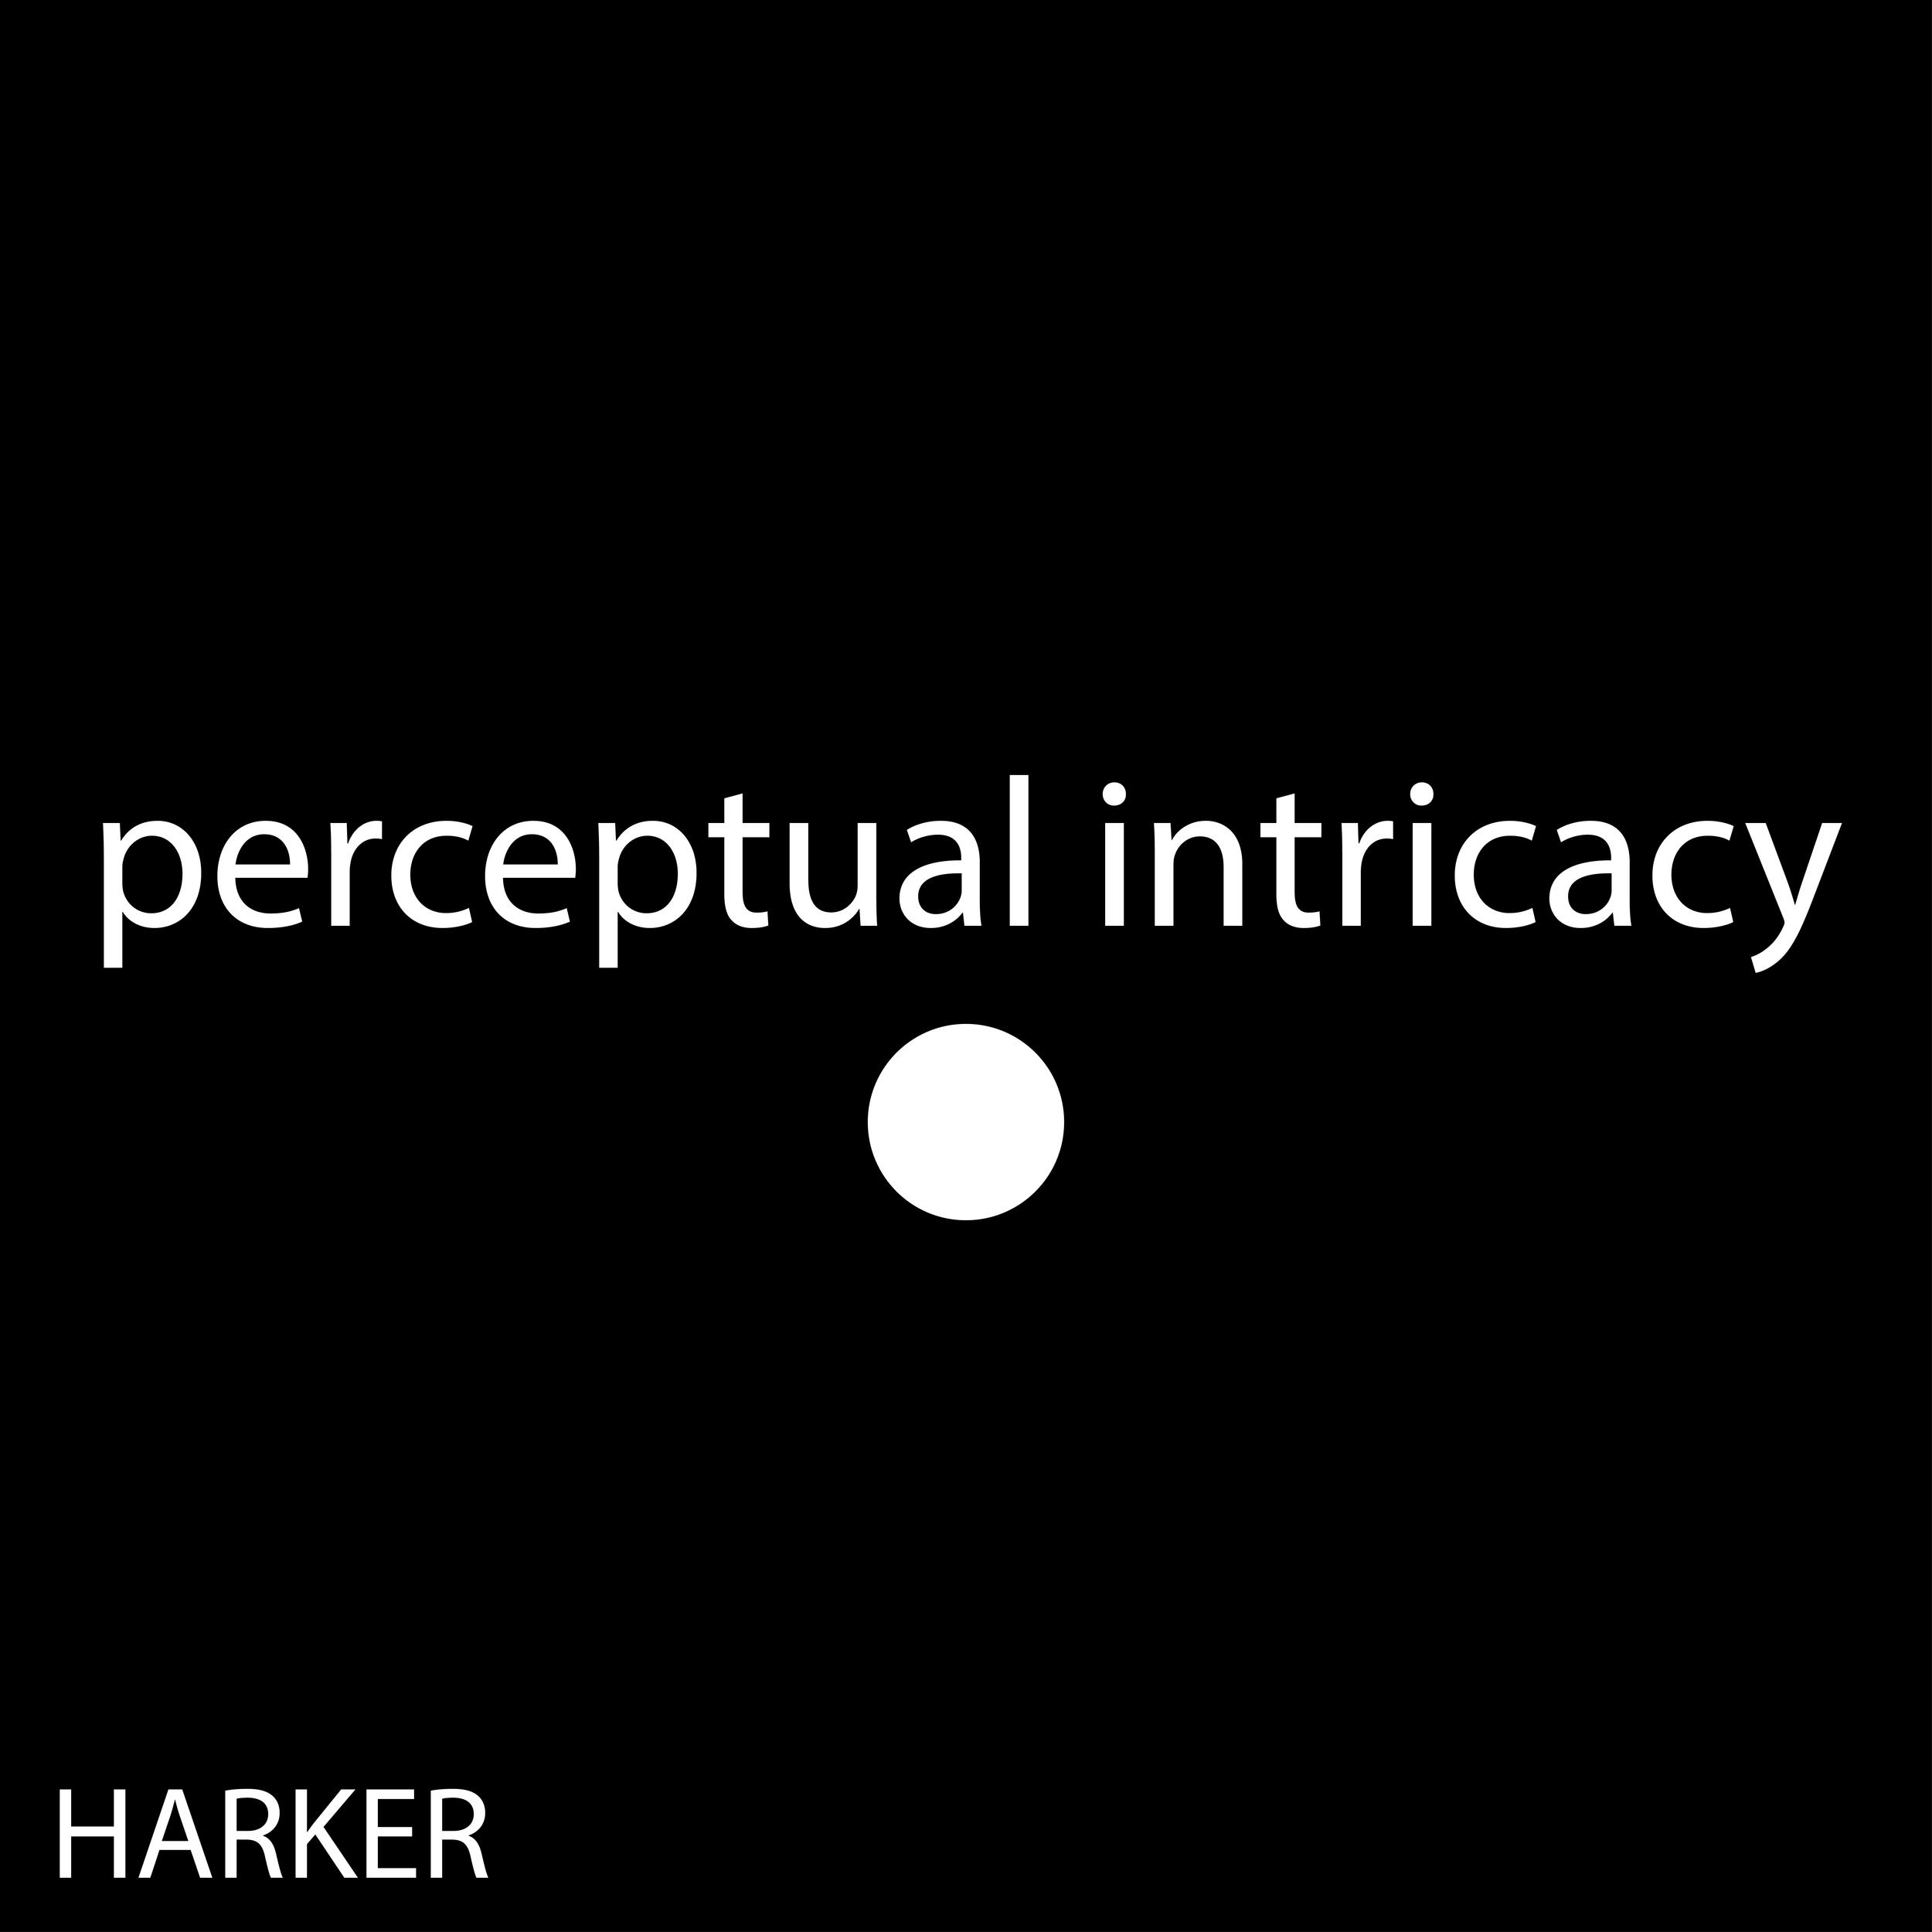 perceptual_intricacy.jpg